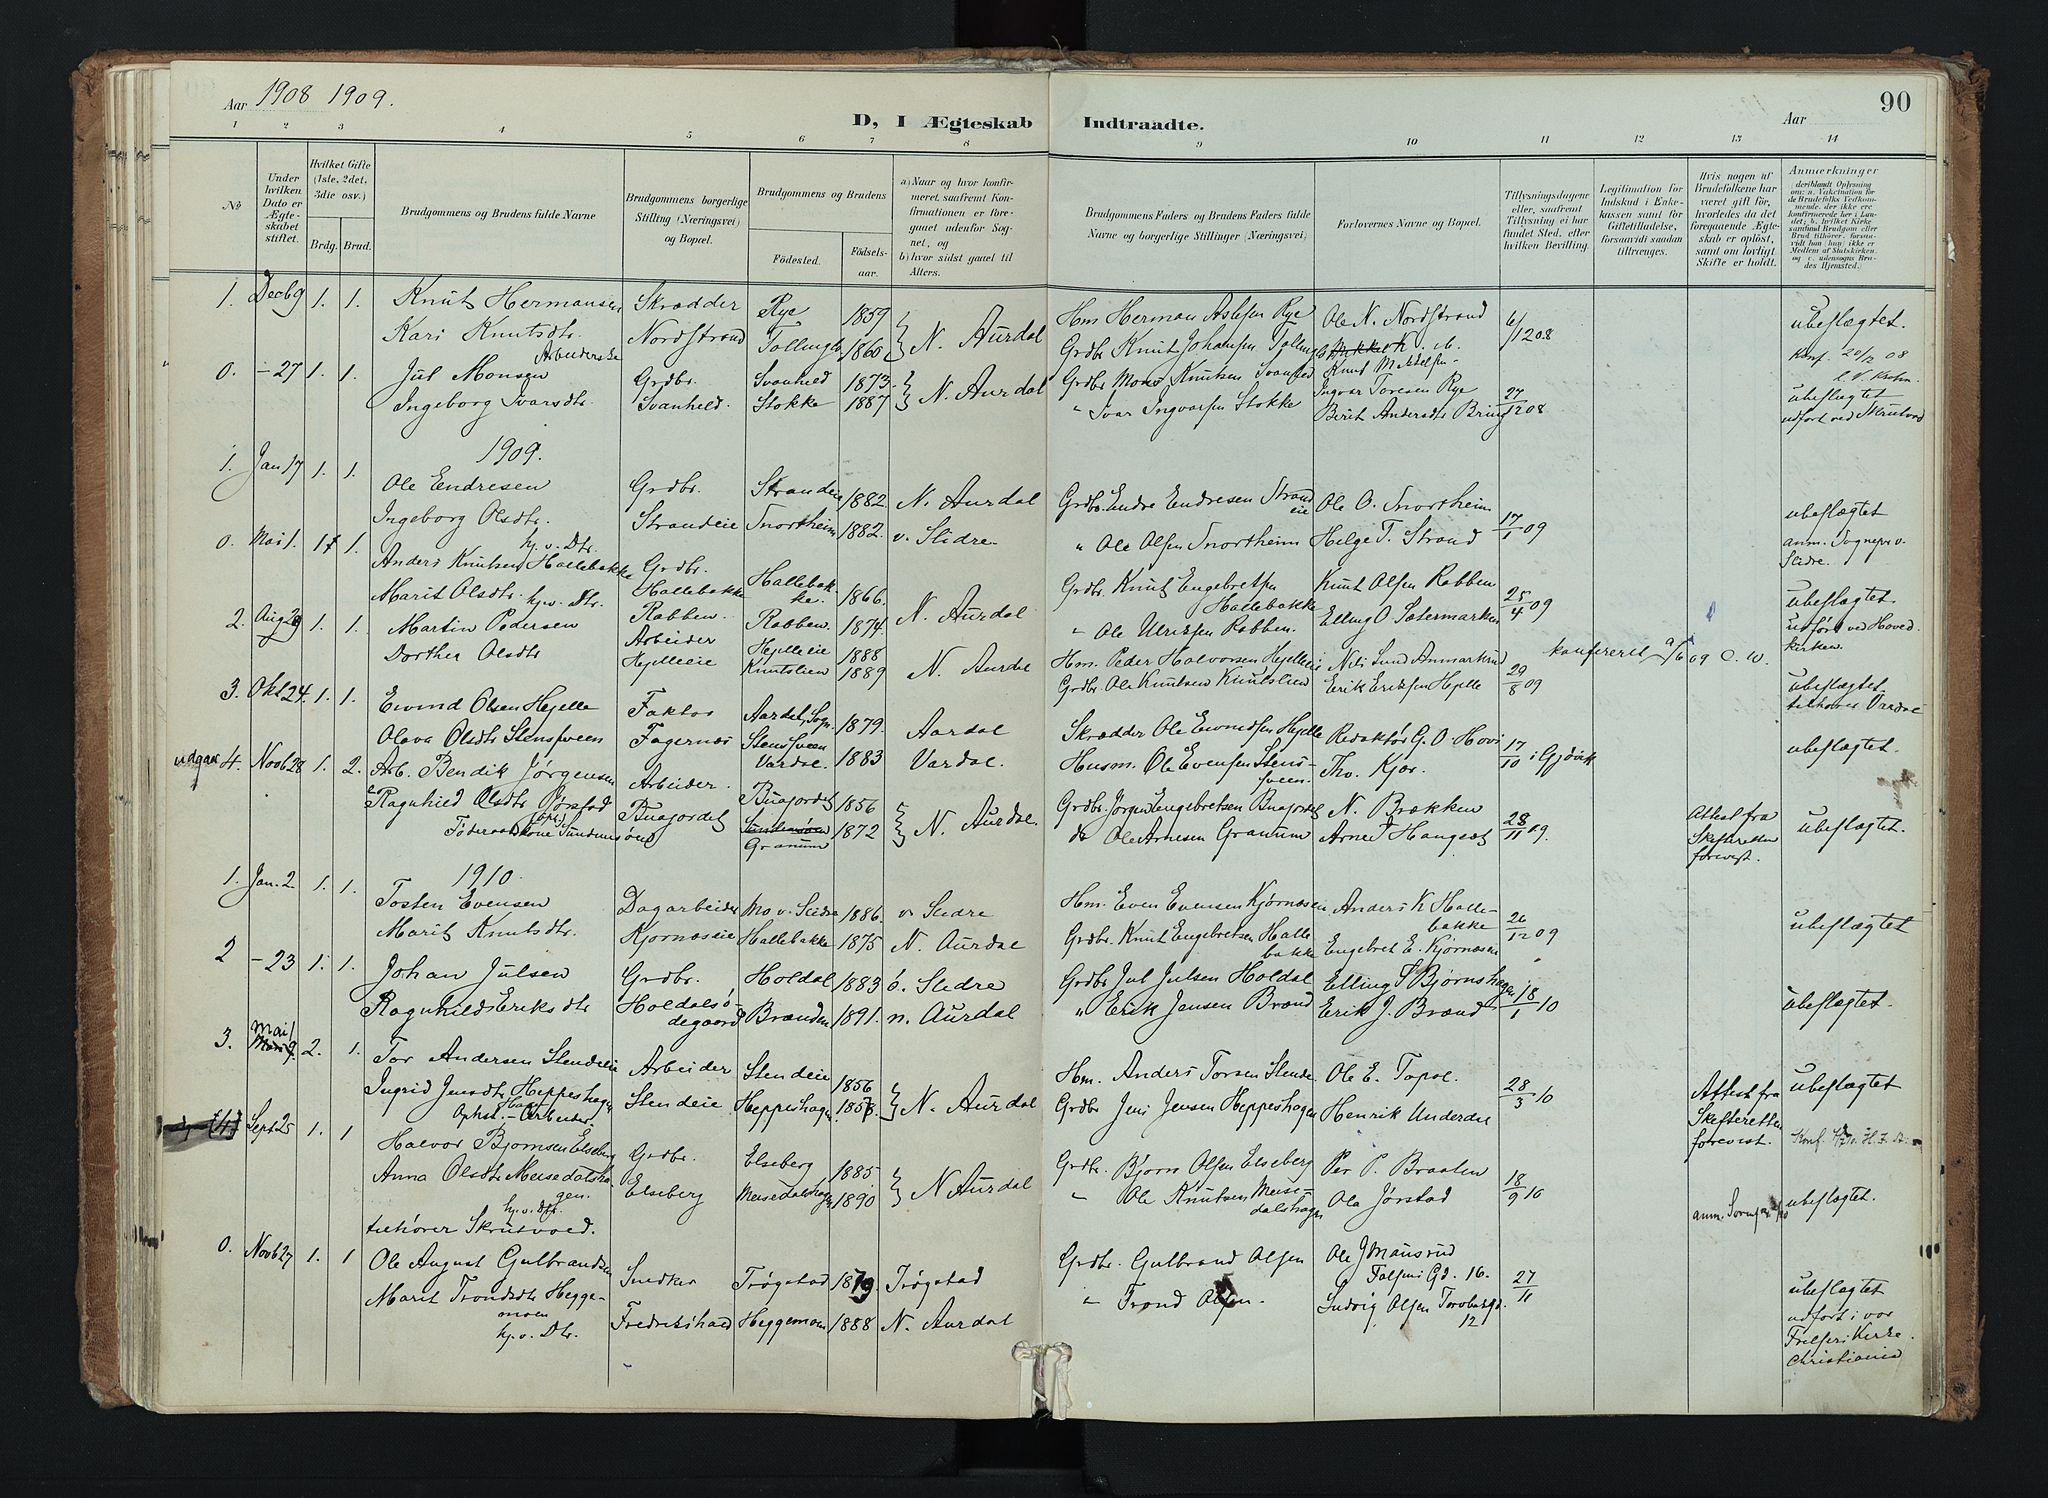 SAH, Nord-Aurdal prestekontor, Ministerialbok nr. 16, 1897-1925, s. 90